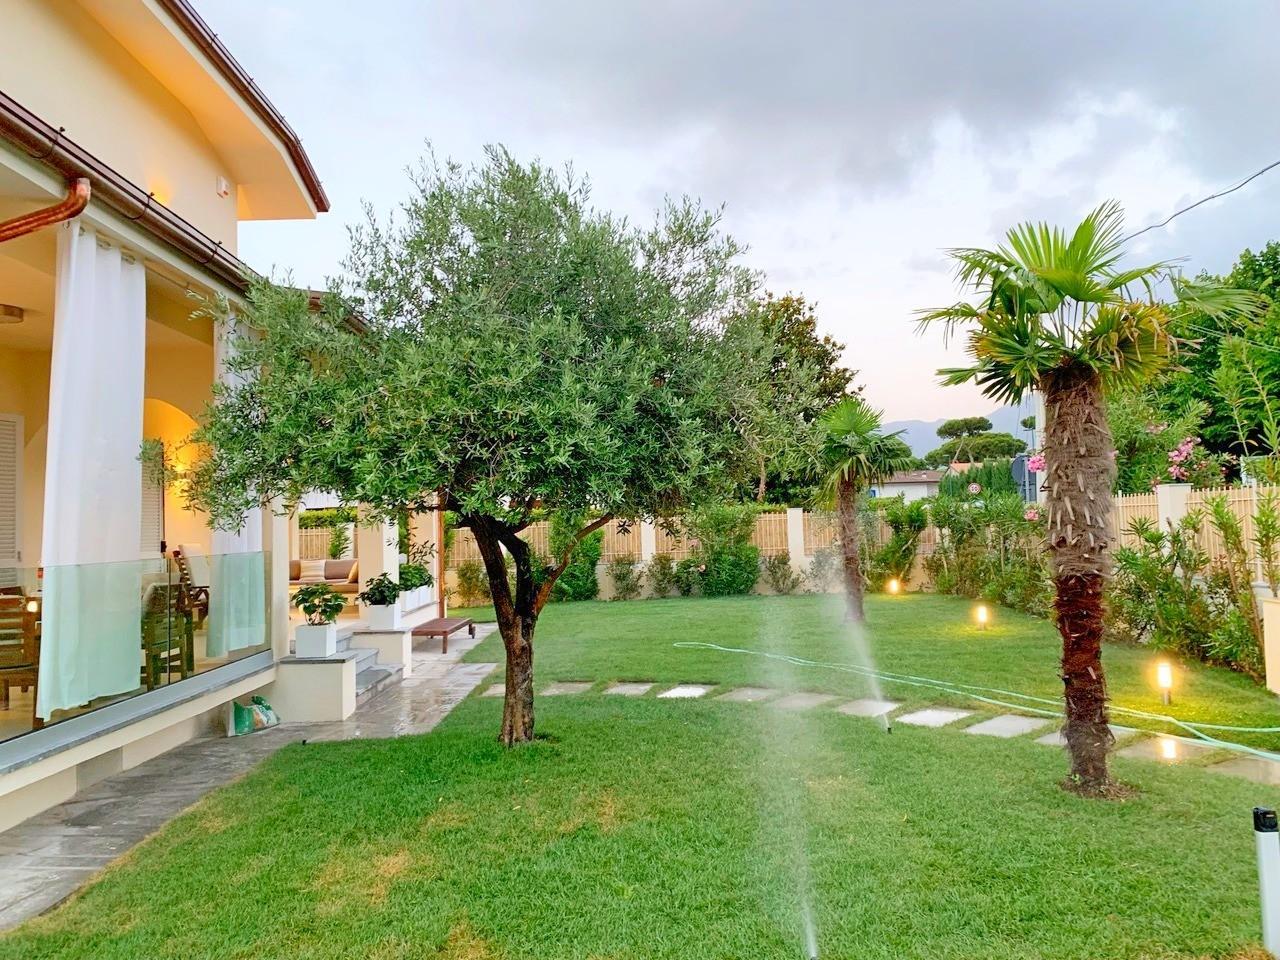 Semi-detached house for holiday rentals in Forte dei Marmi (LU)